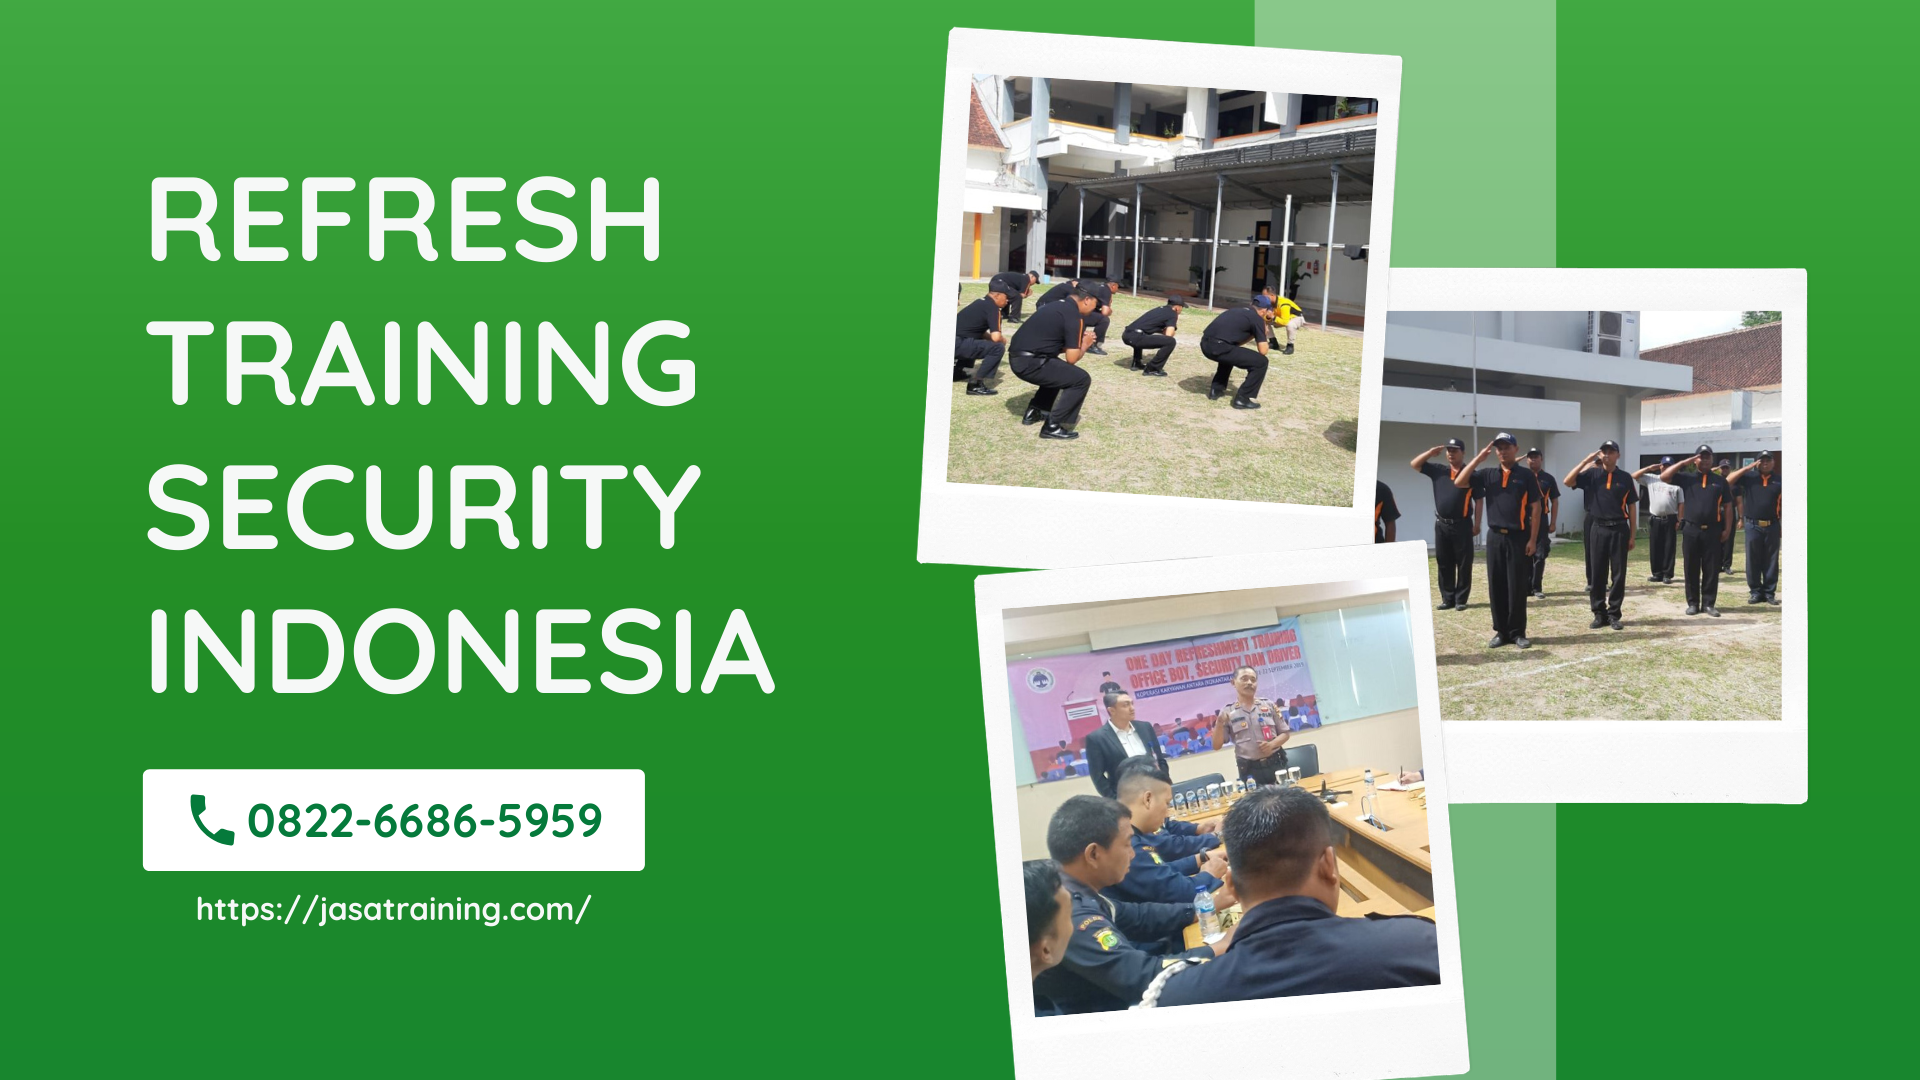 Refresh Training Security Indonesia